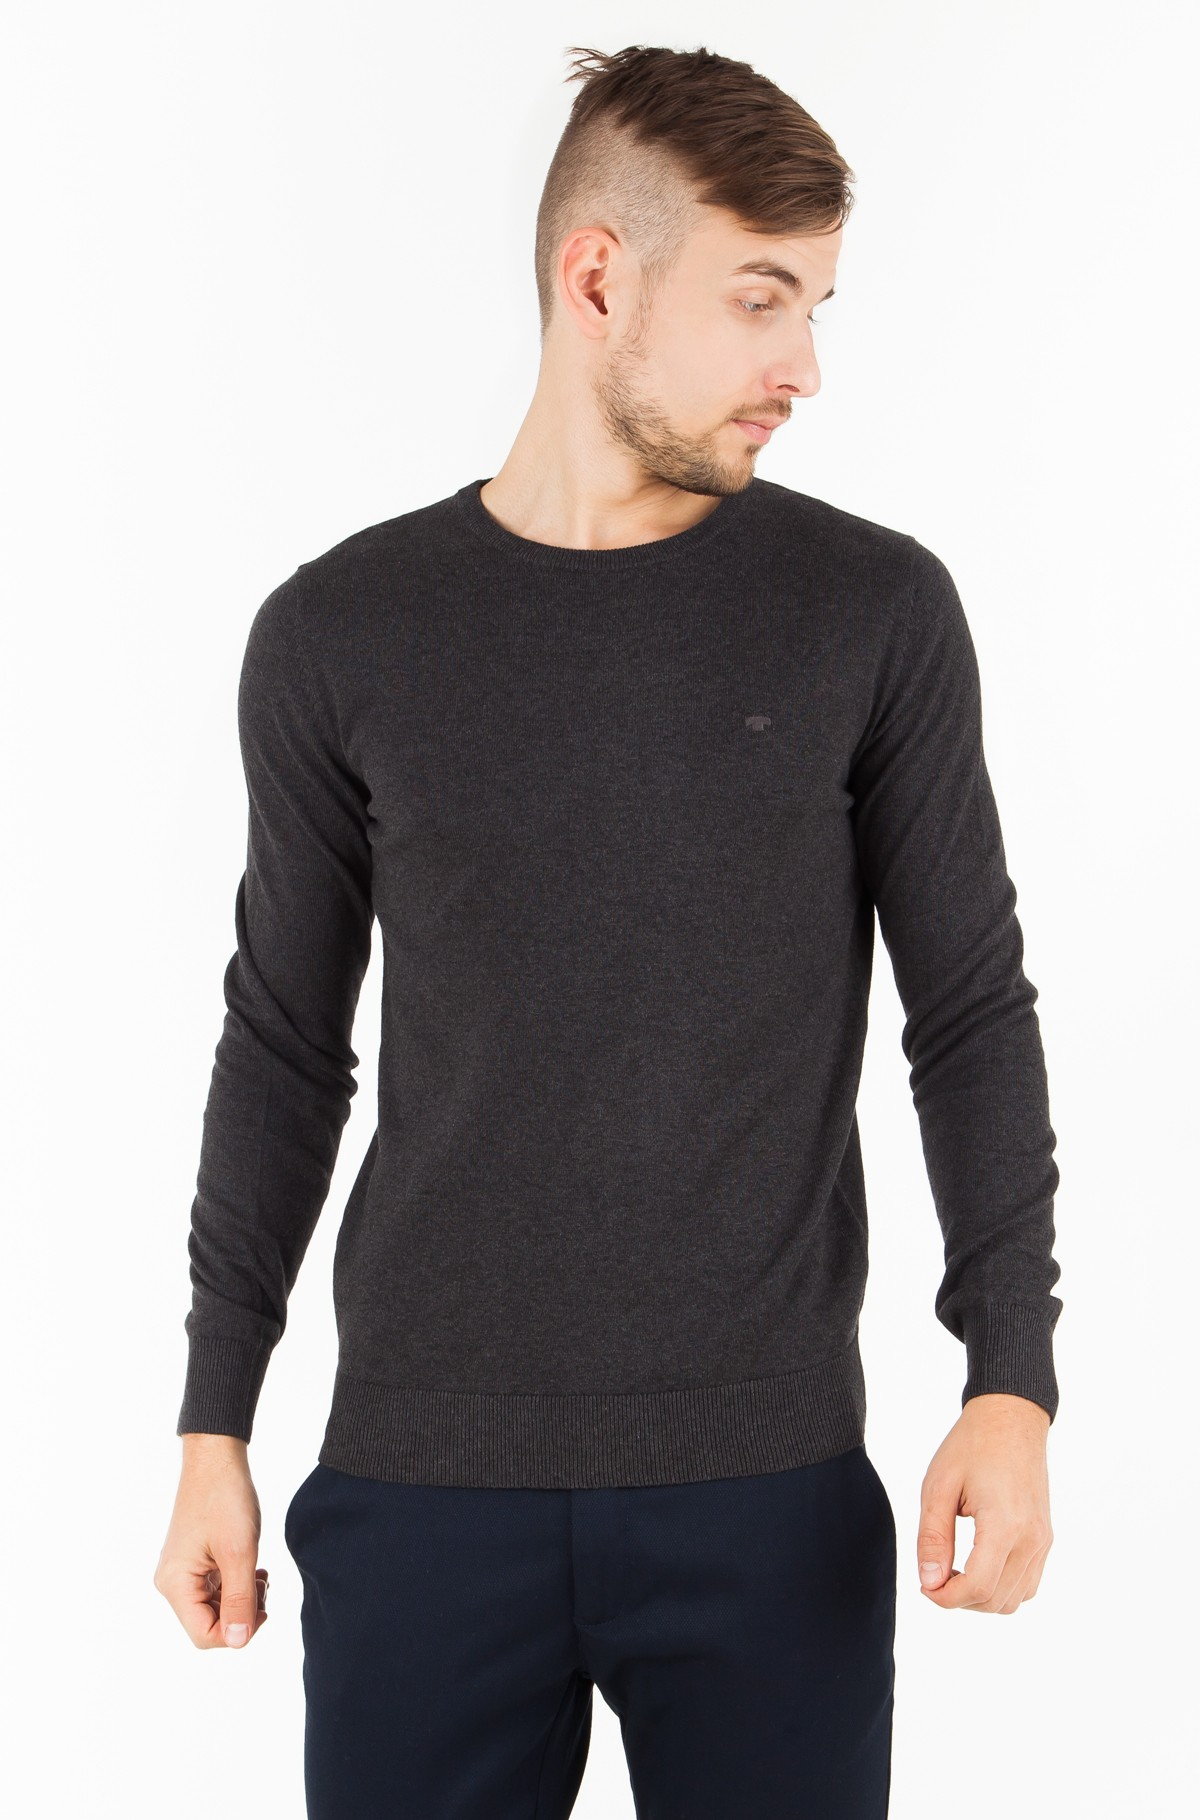 Sweater 3022880.09.10-full-1